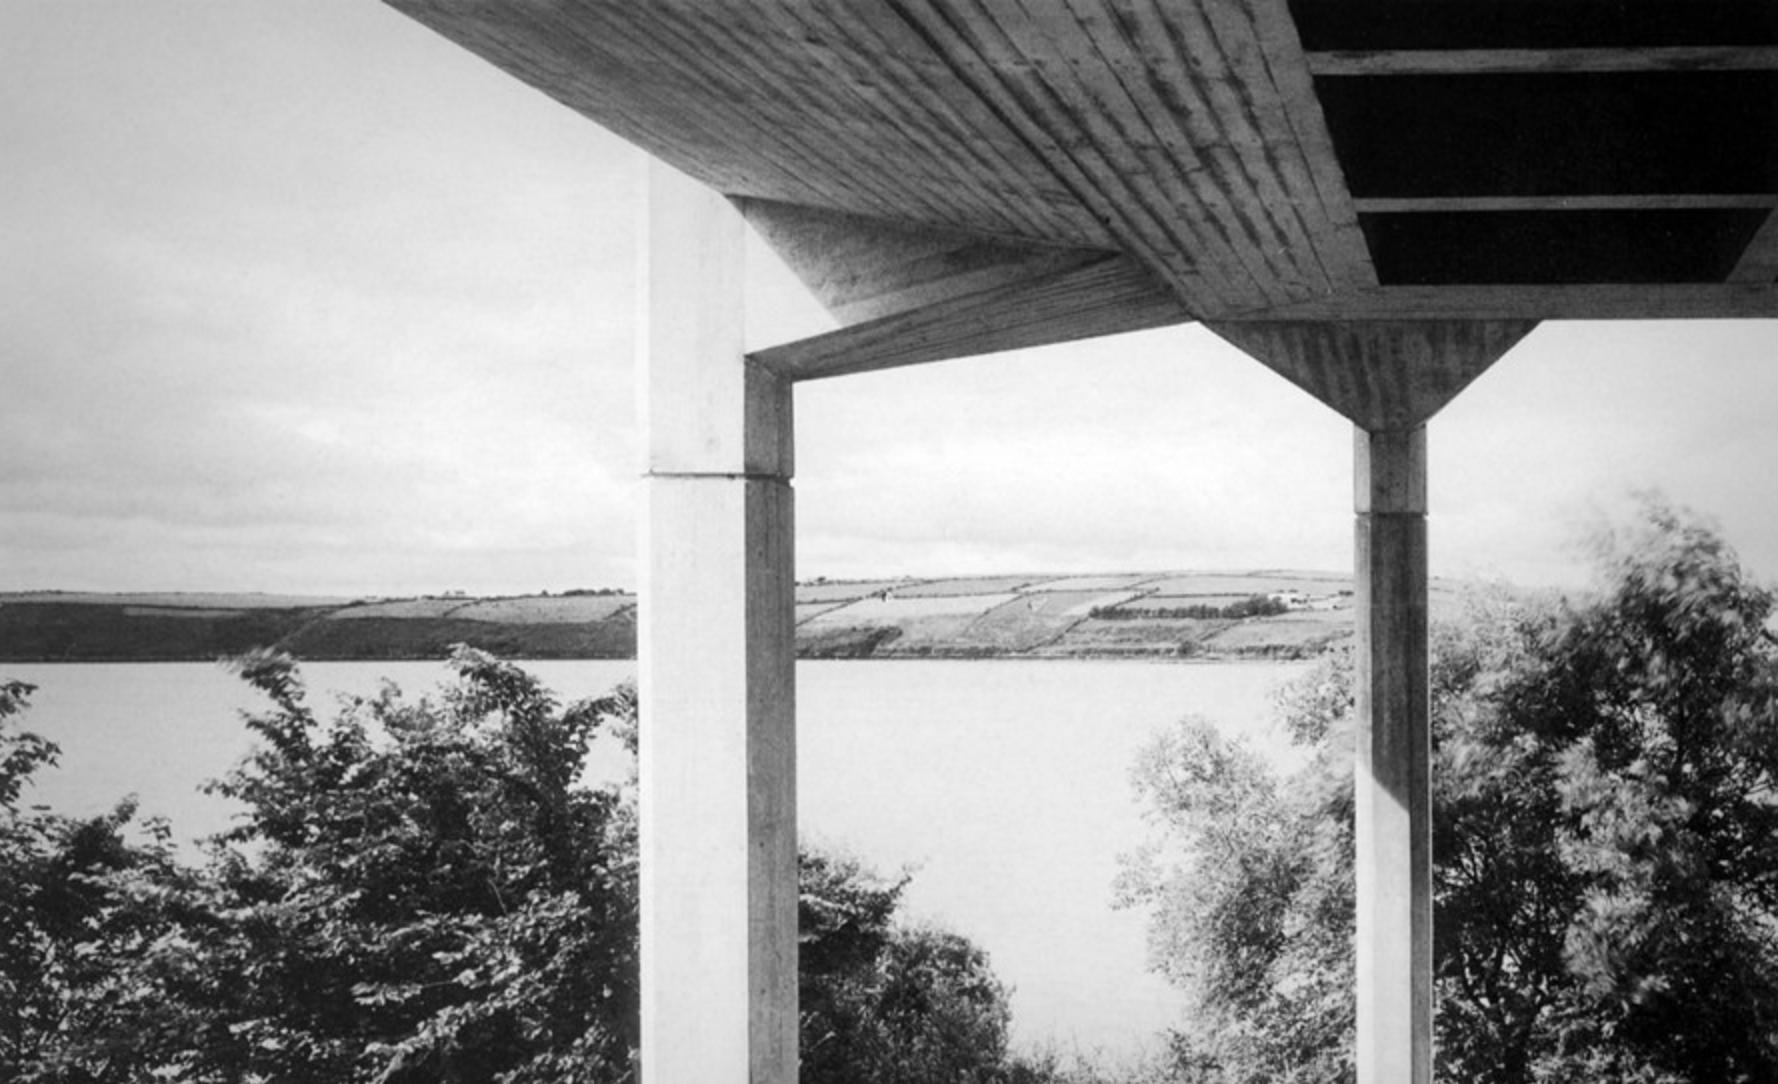 OFlaherty House, Kinsale - Robin Walker - Prime Architecture London Blog 7.png